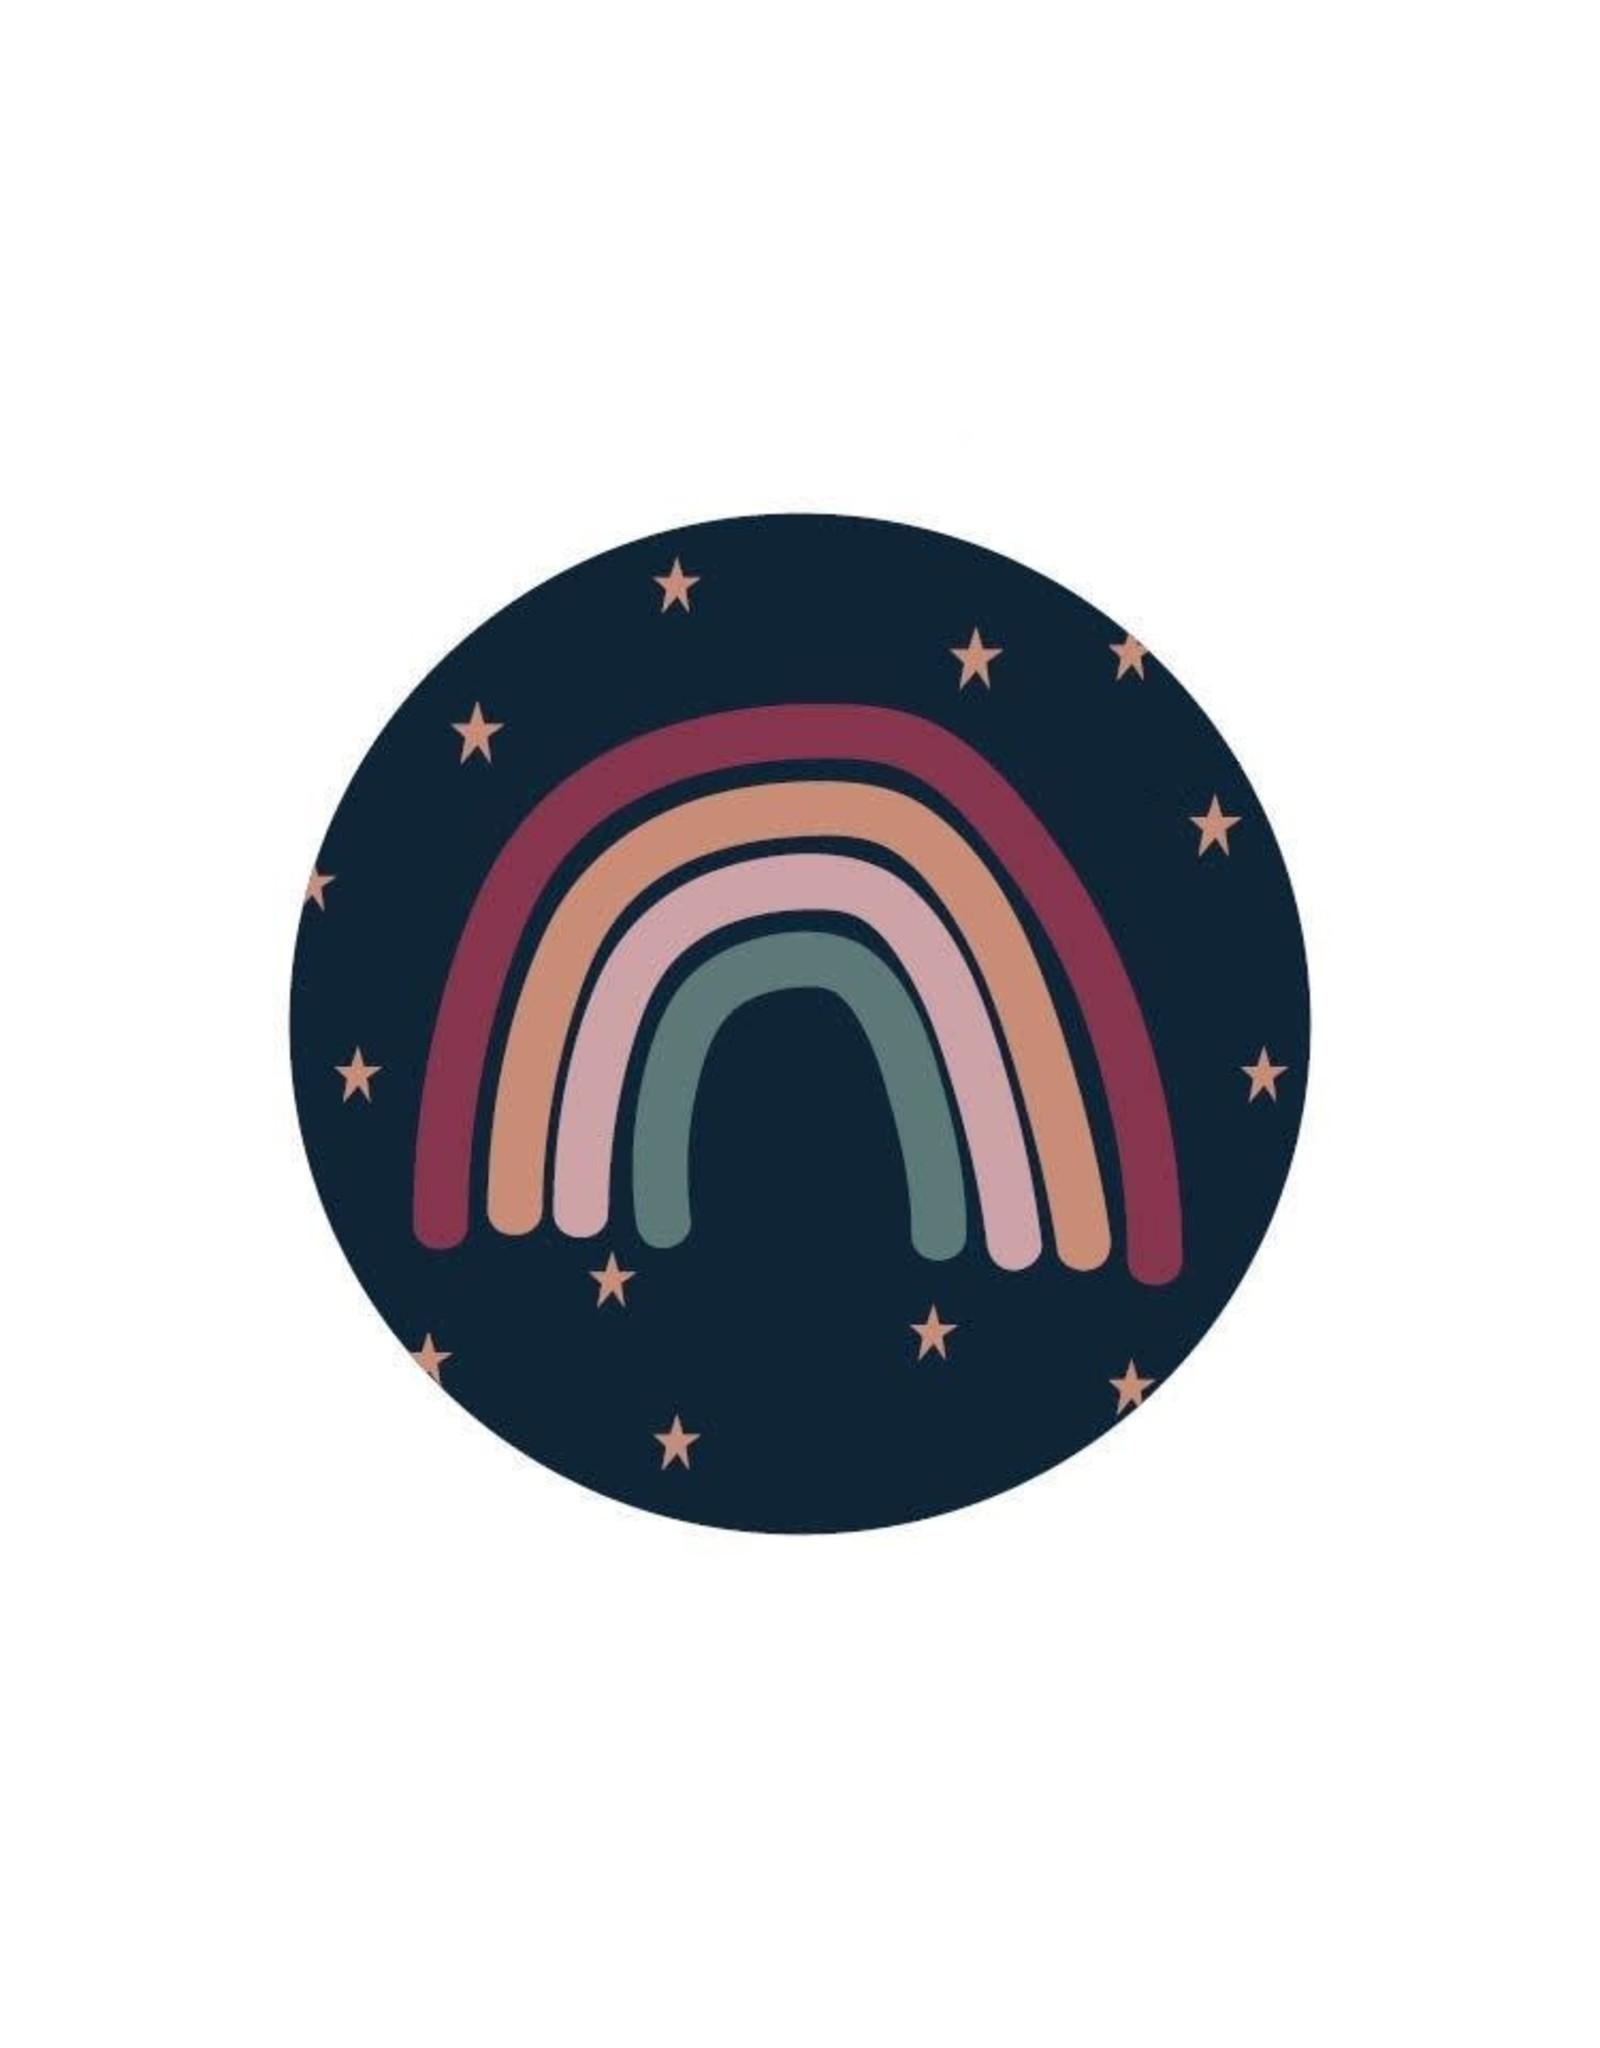 Stickers 5st. Regenboog